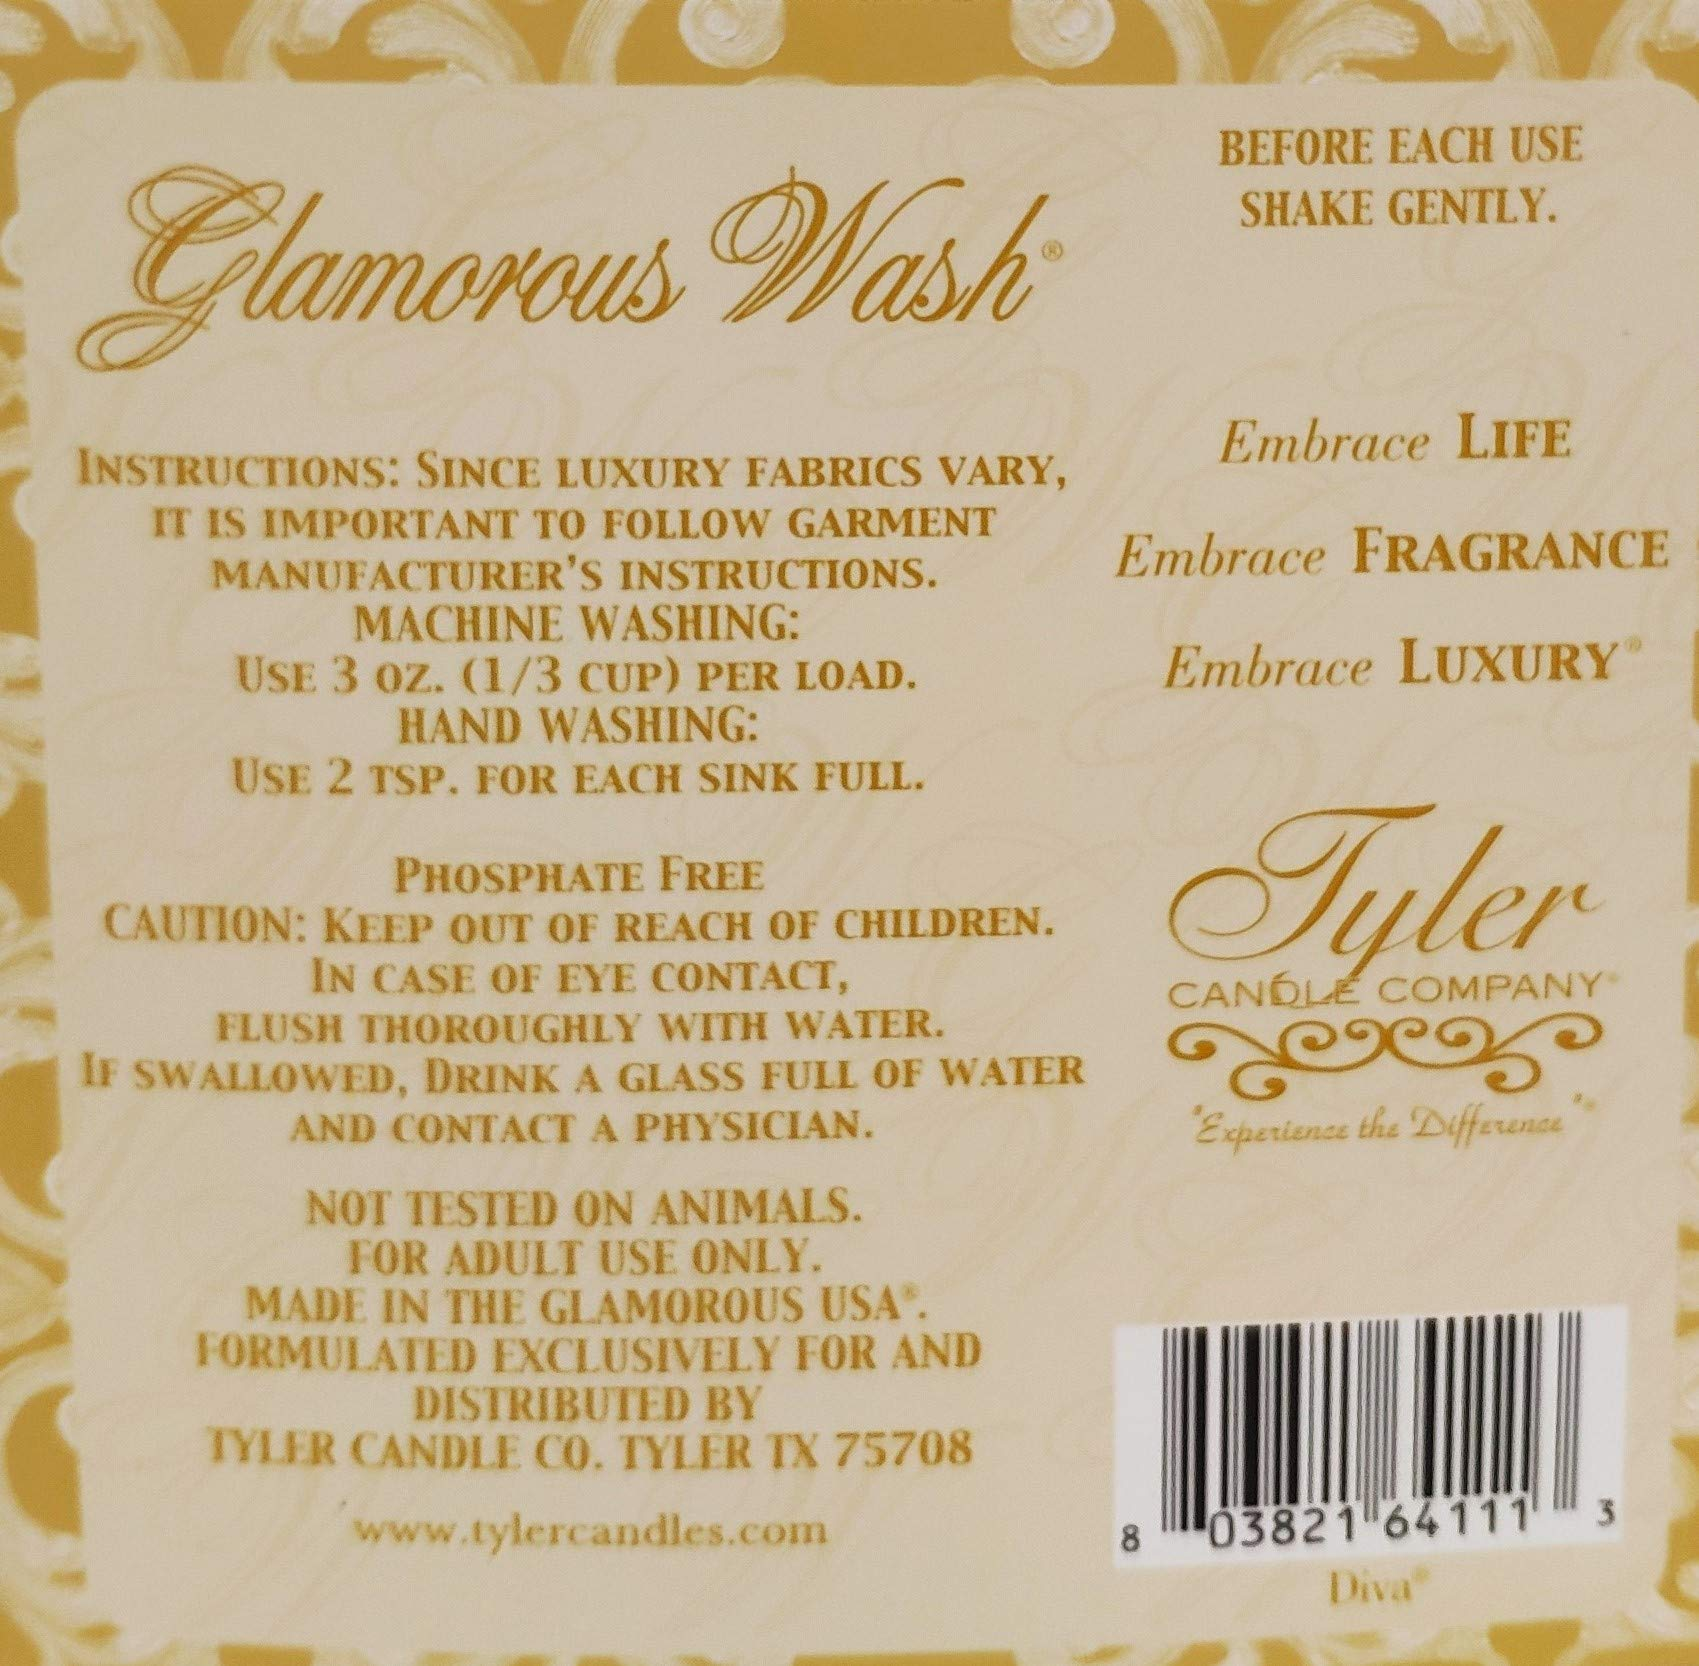 Tyler Candle Glamorous Wash Half Gallon (64 OZ) Laundry Detergent/Bonus Glamorous Sachet Single Pouch and Autoglam (Diva)